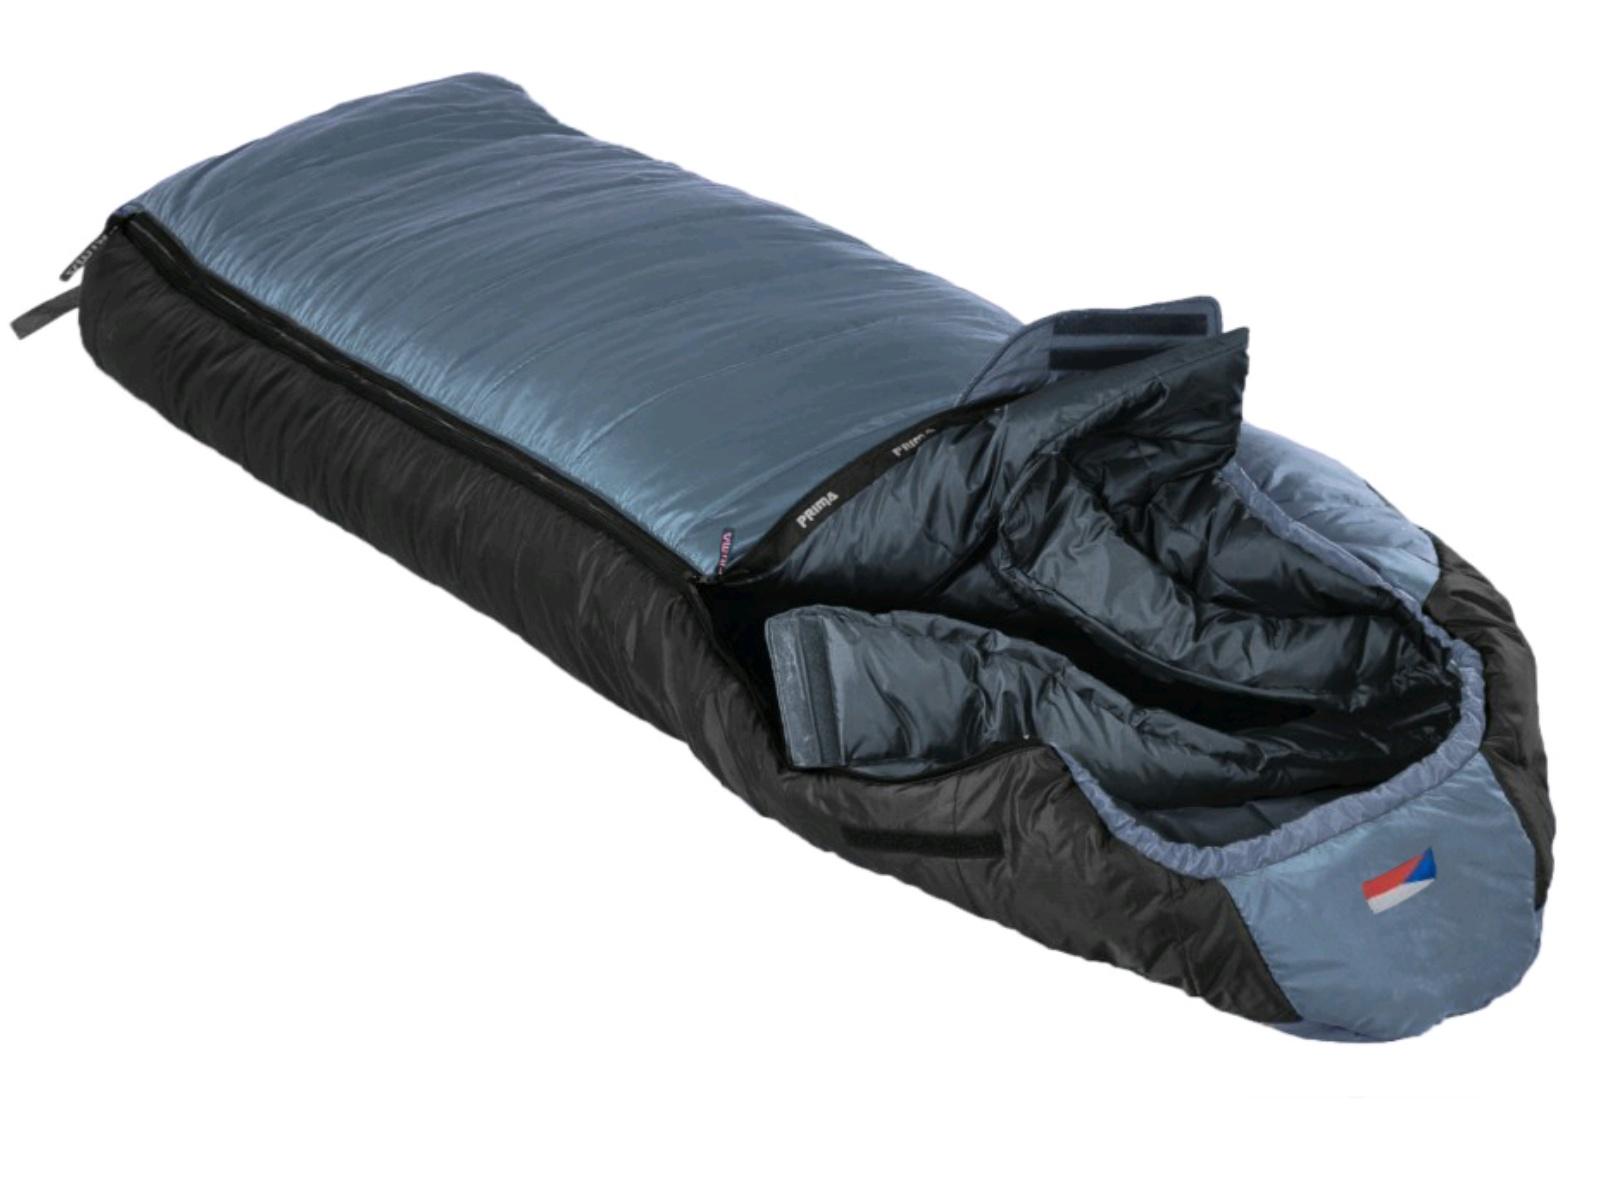 Spací pytel PRIMA Manaslu 230 Comfortable šedý - levý zip